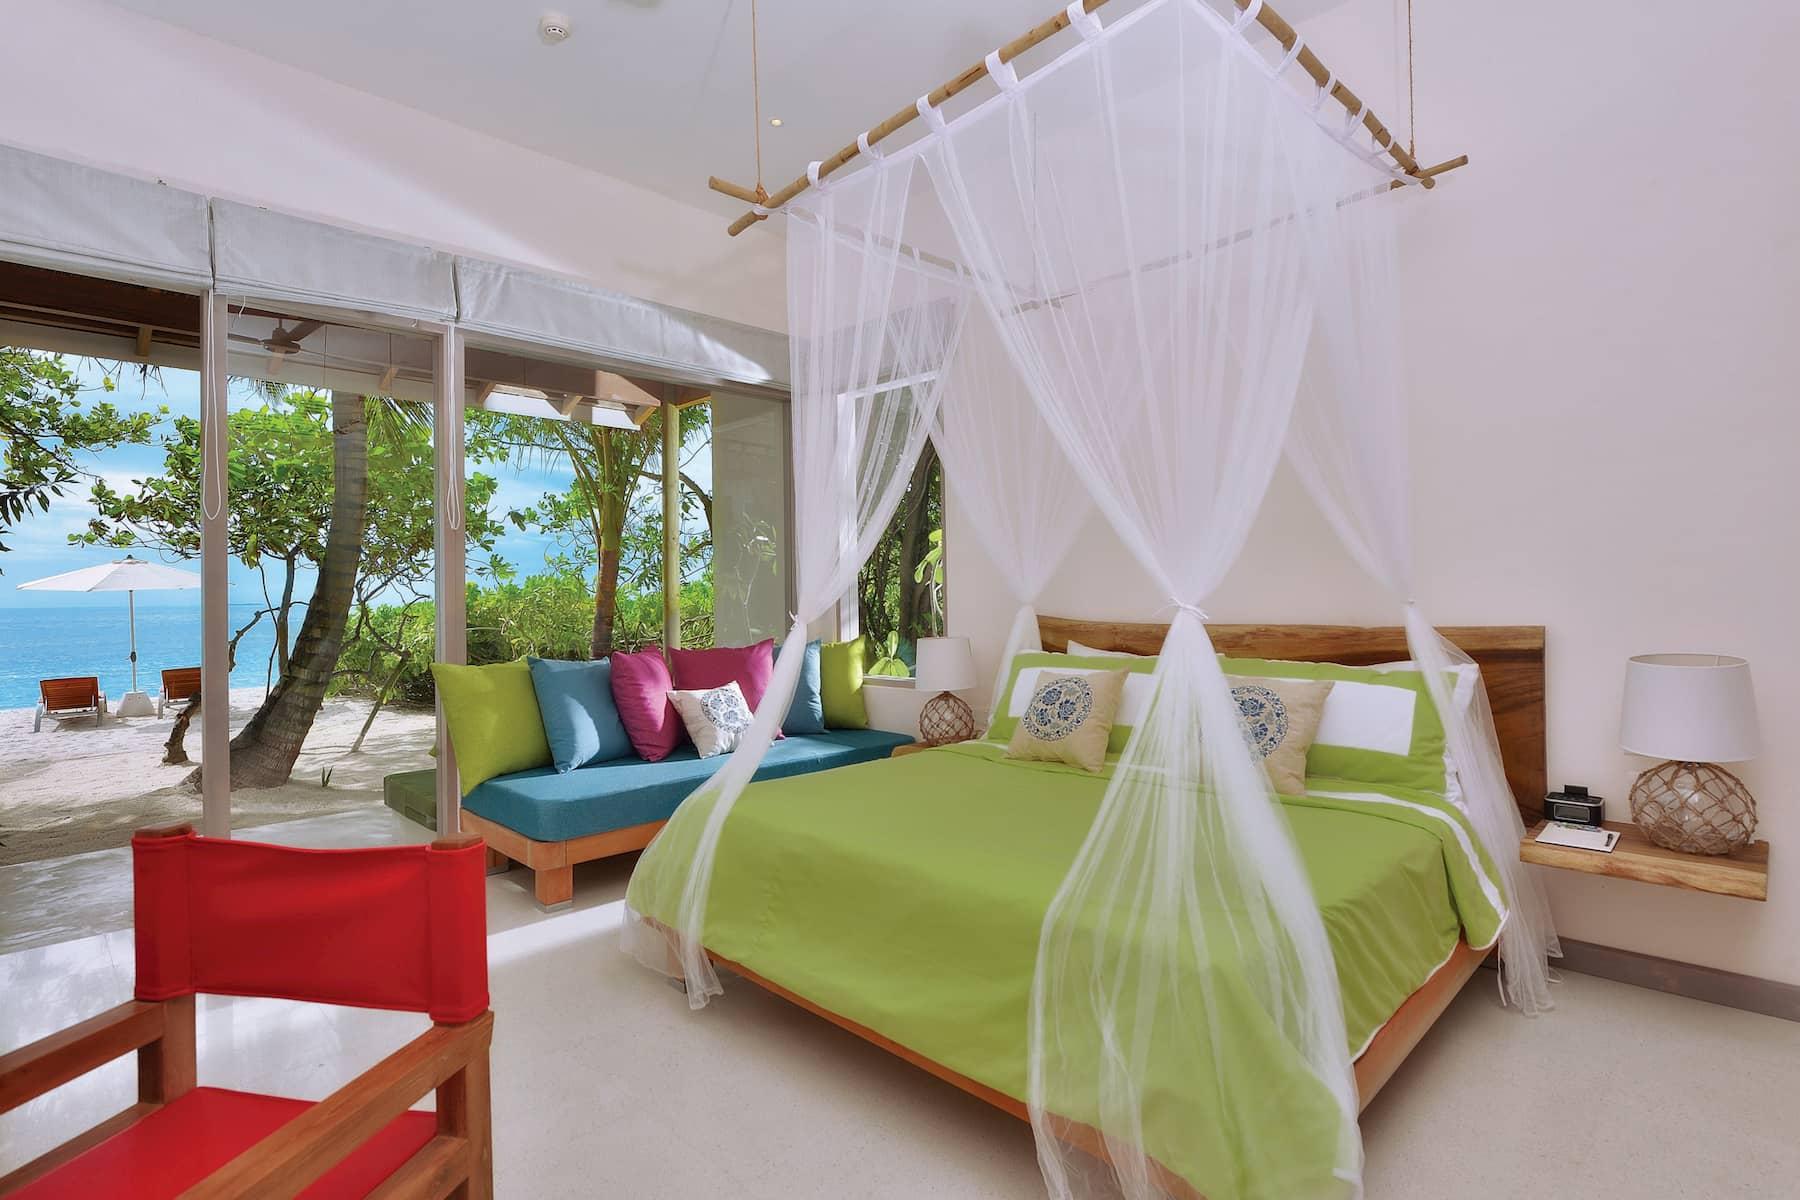 Resort Oblu By Atmosdphere at Helengeli deluxe beach villa